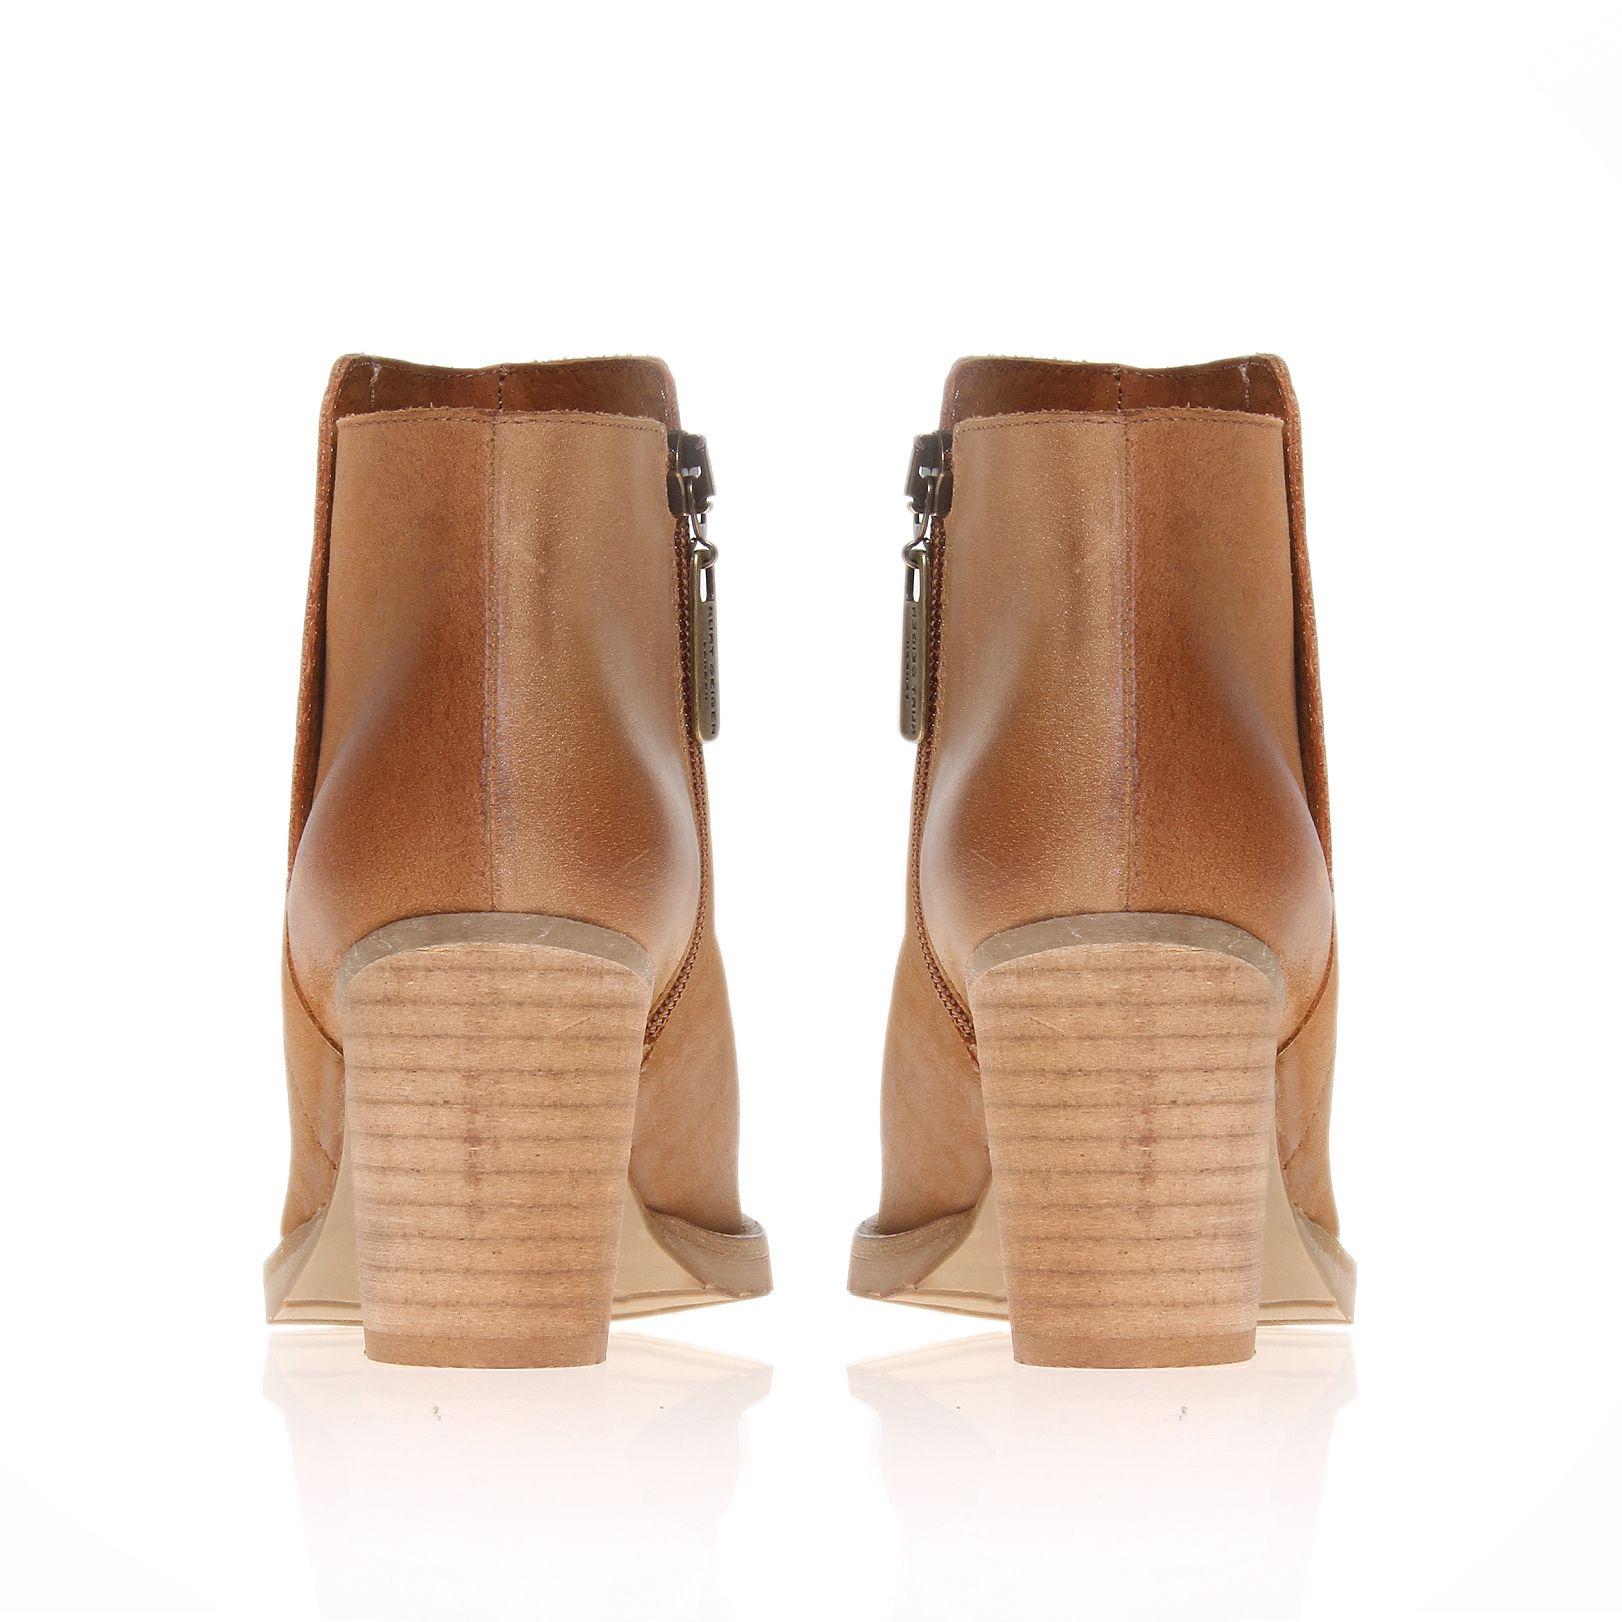 Kurt Geiger Soda Boots in Tan (Brown)